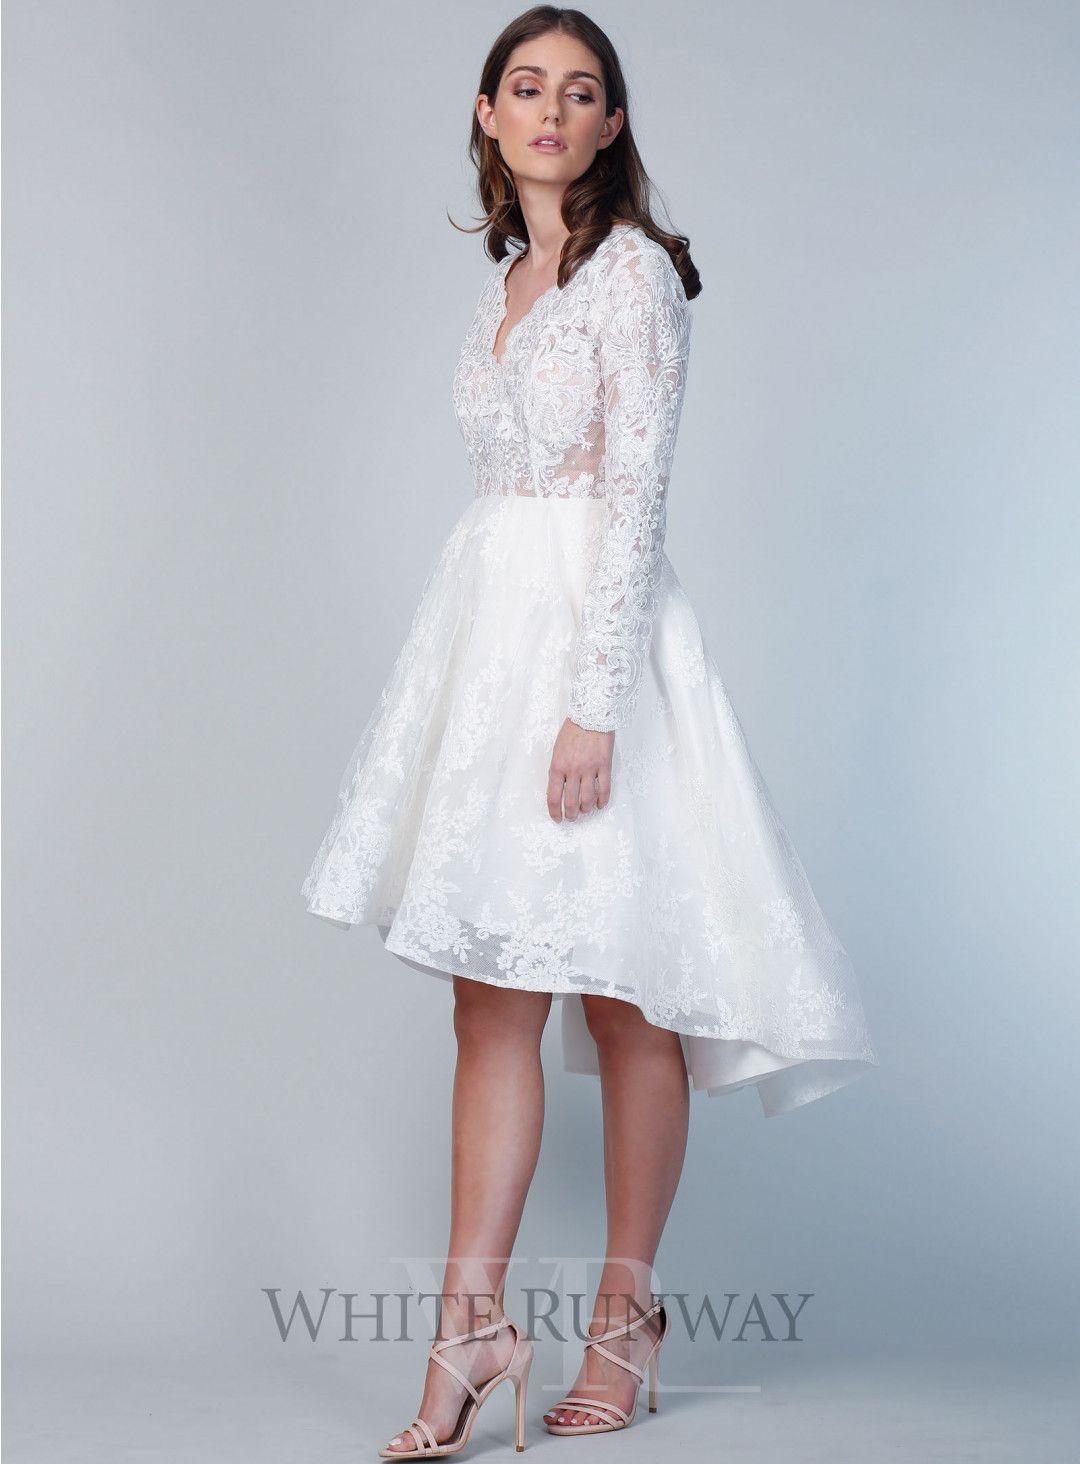 Long sleeve cocktail dress for wedding  Emi Lace Cocktail Dress  Bridal Gowns CocktailTeaLengthMidi